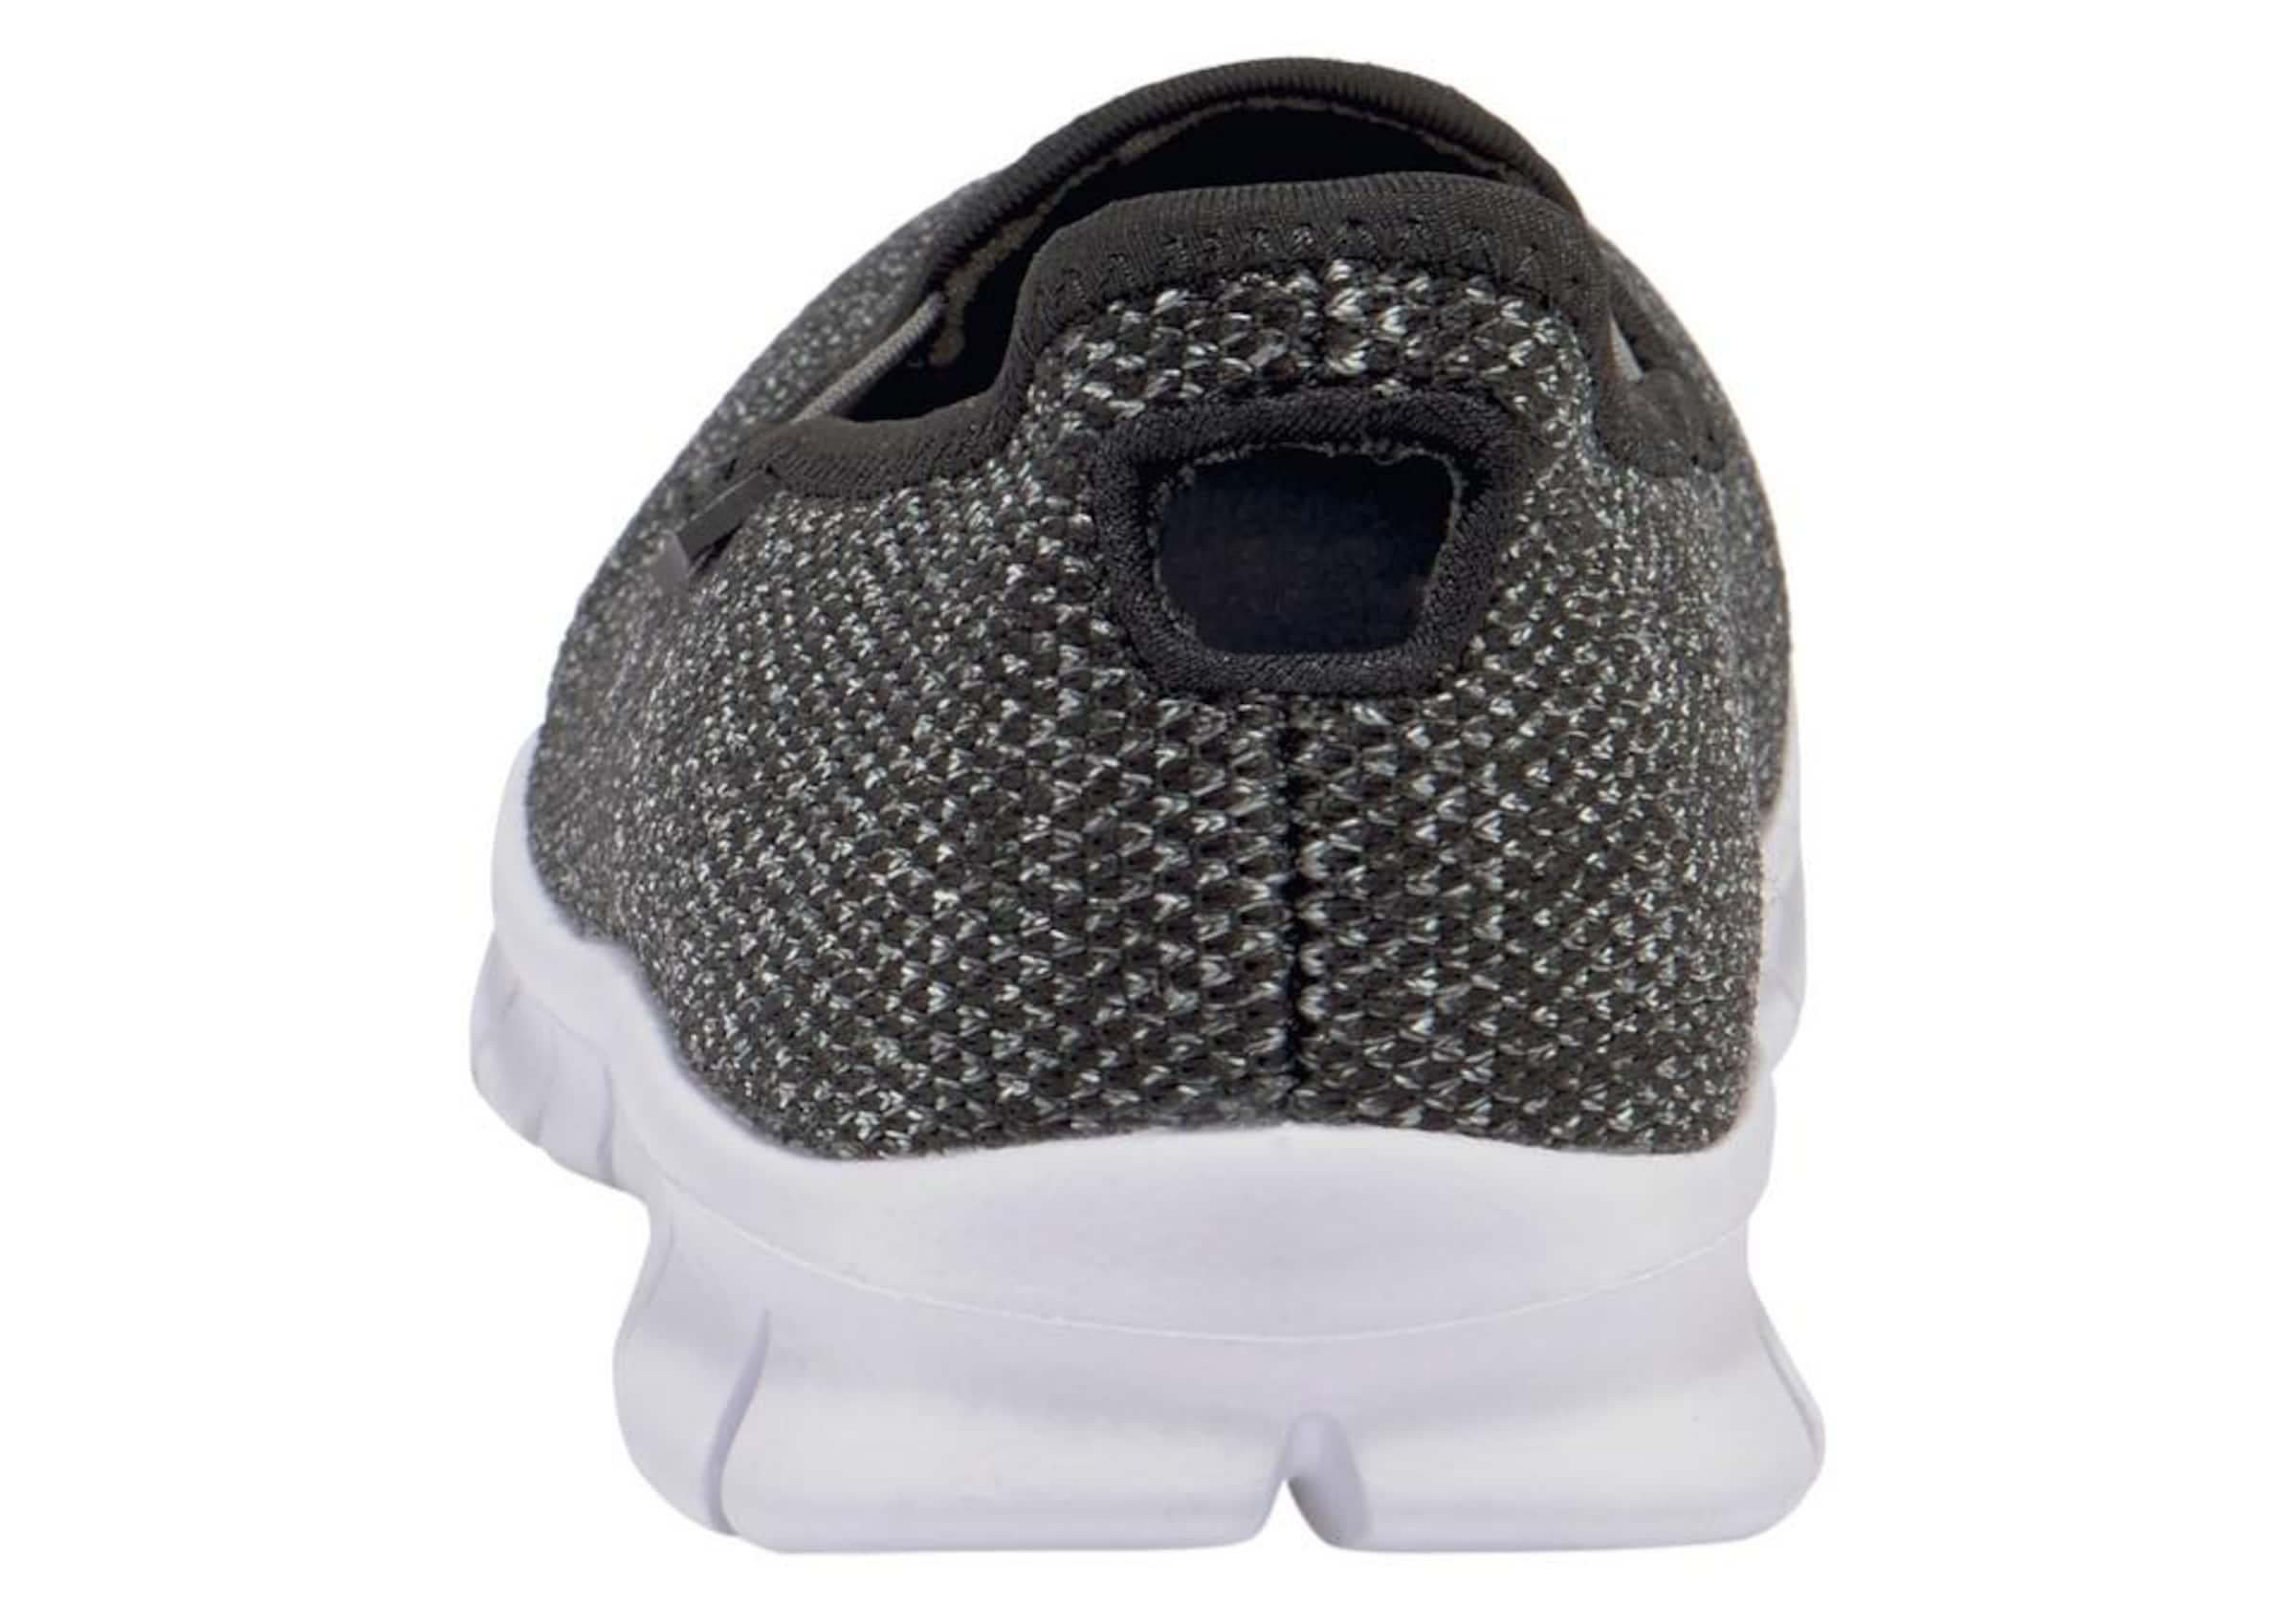 Knt' Sneaker 'gomera HellgrauSchwarz Kappa In oQWxBrCde